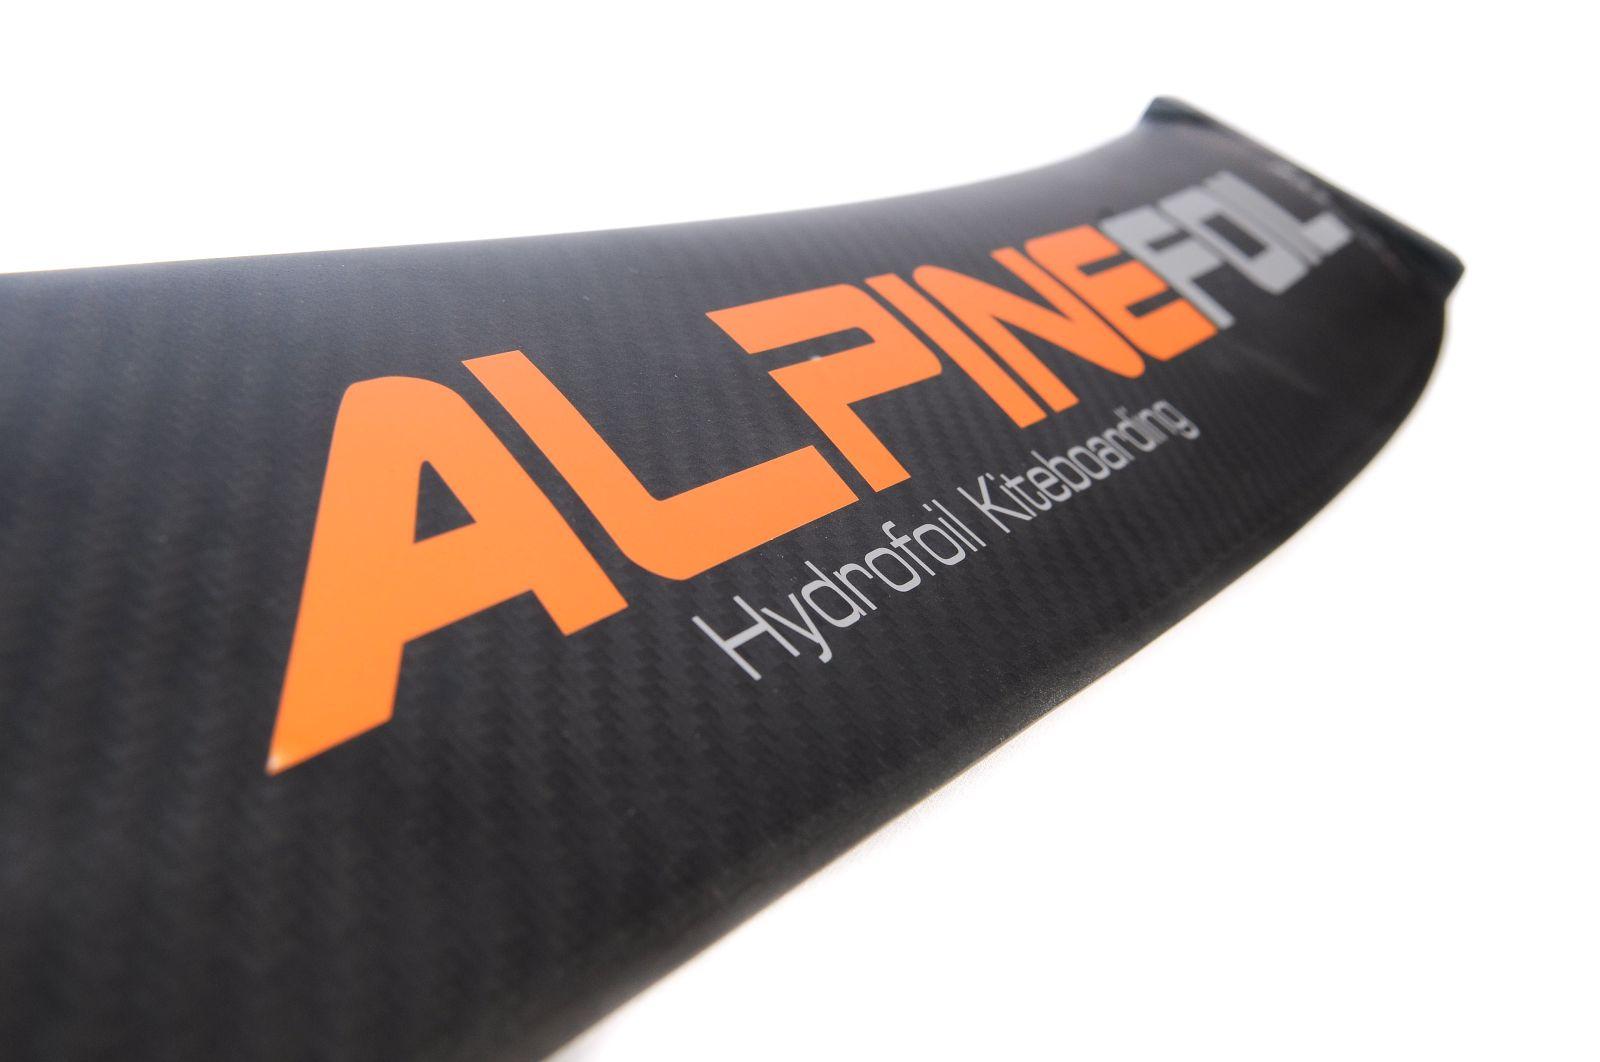 Kitefoil carbon 5 0 alpinefoil hydrofoil foilboard 18612208 1